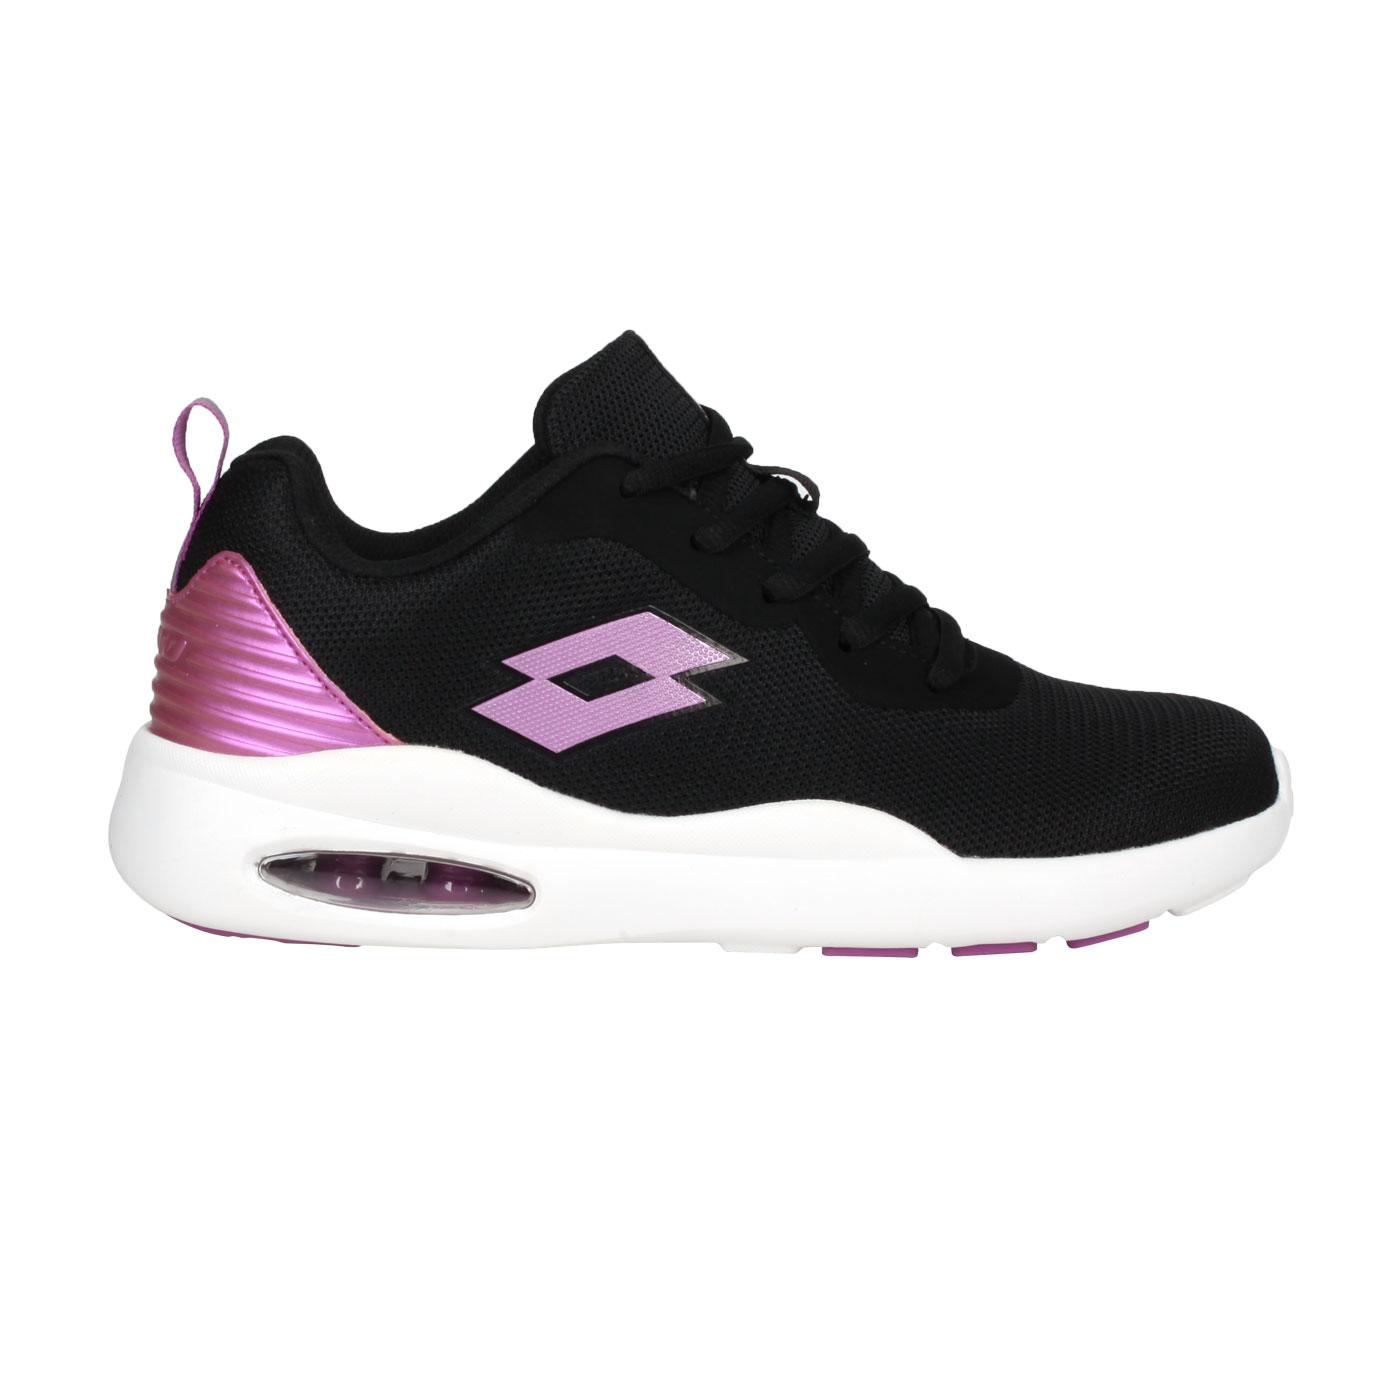 LOTTO 女款輕氣墊跑鞋 LT0AWR2110 - 黑粉紫